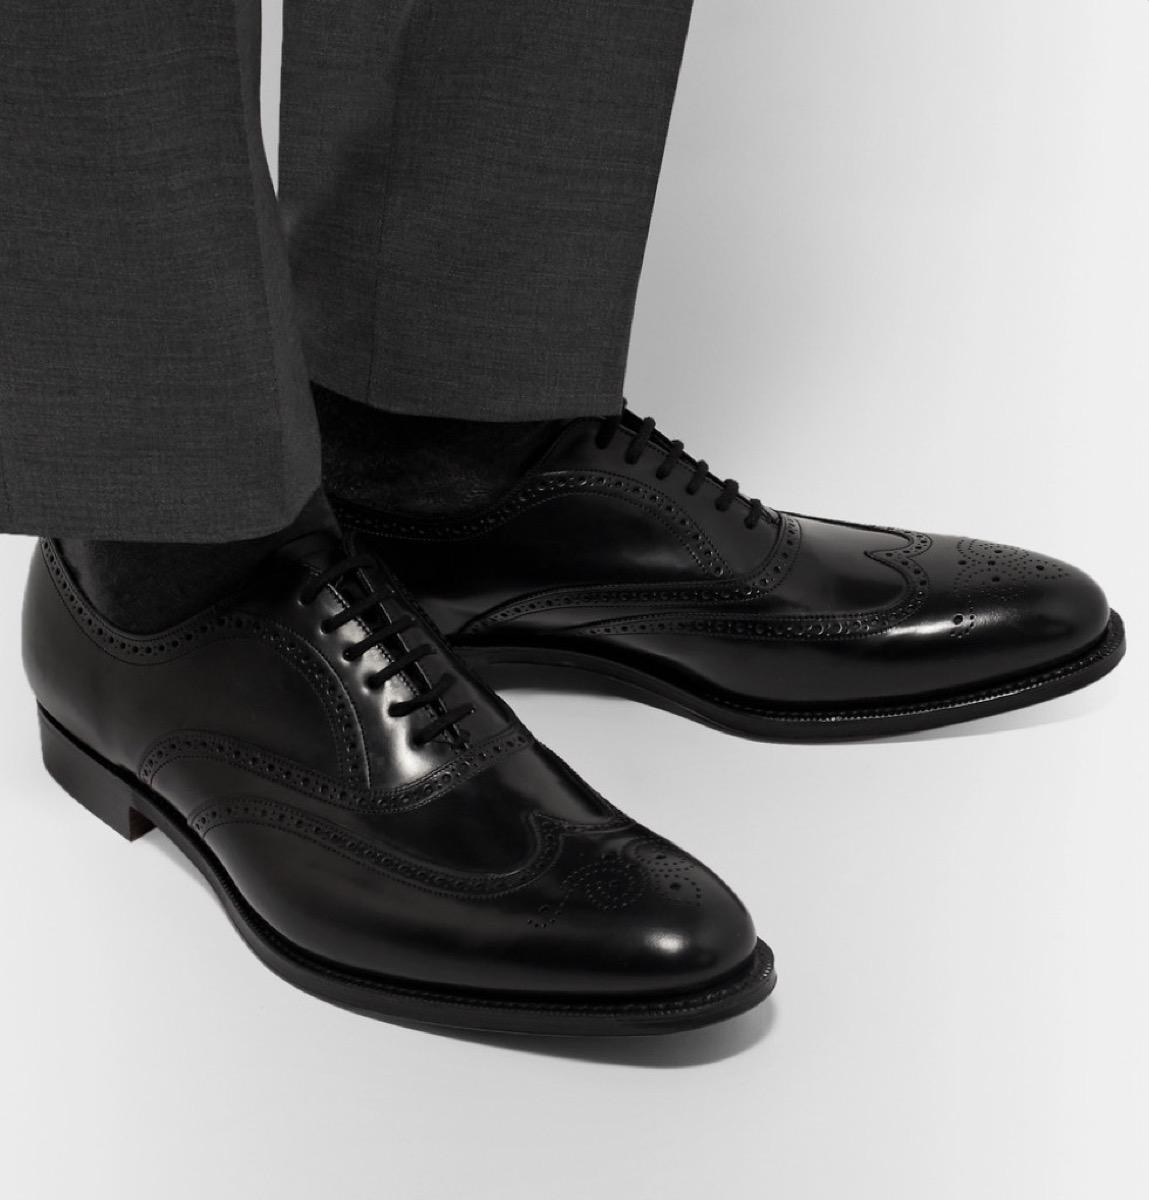 man wearing gray pants and black shiny shoes